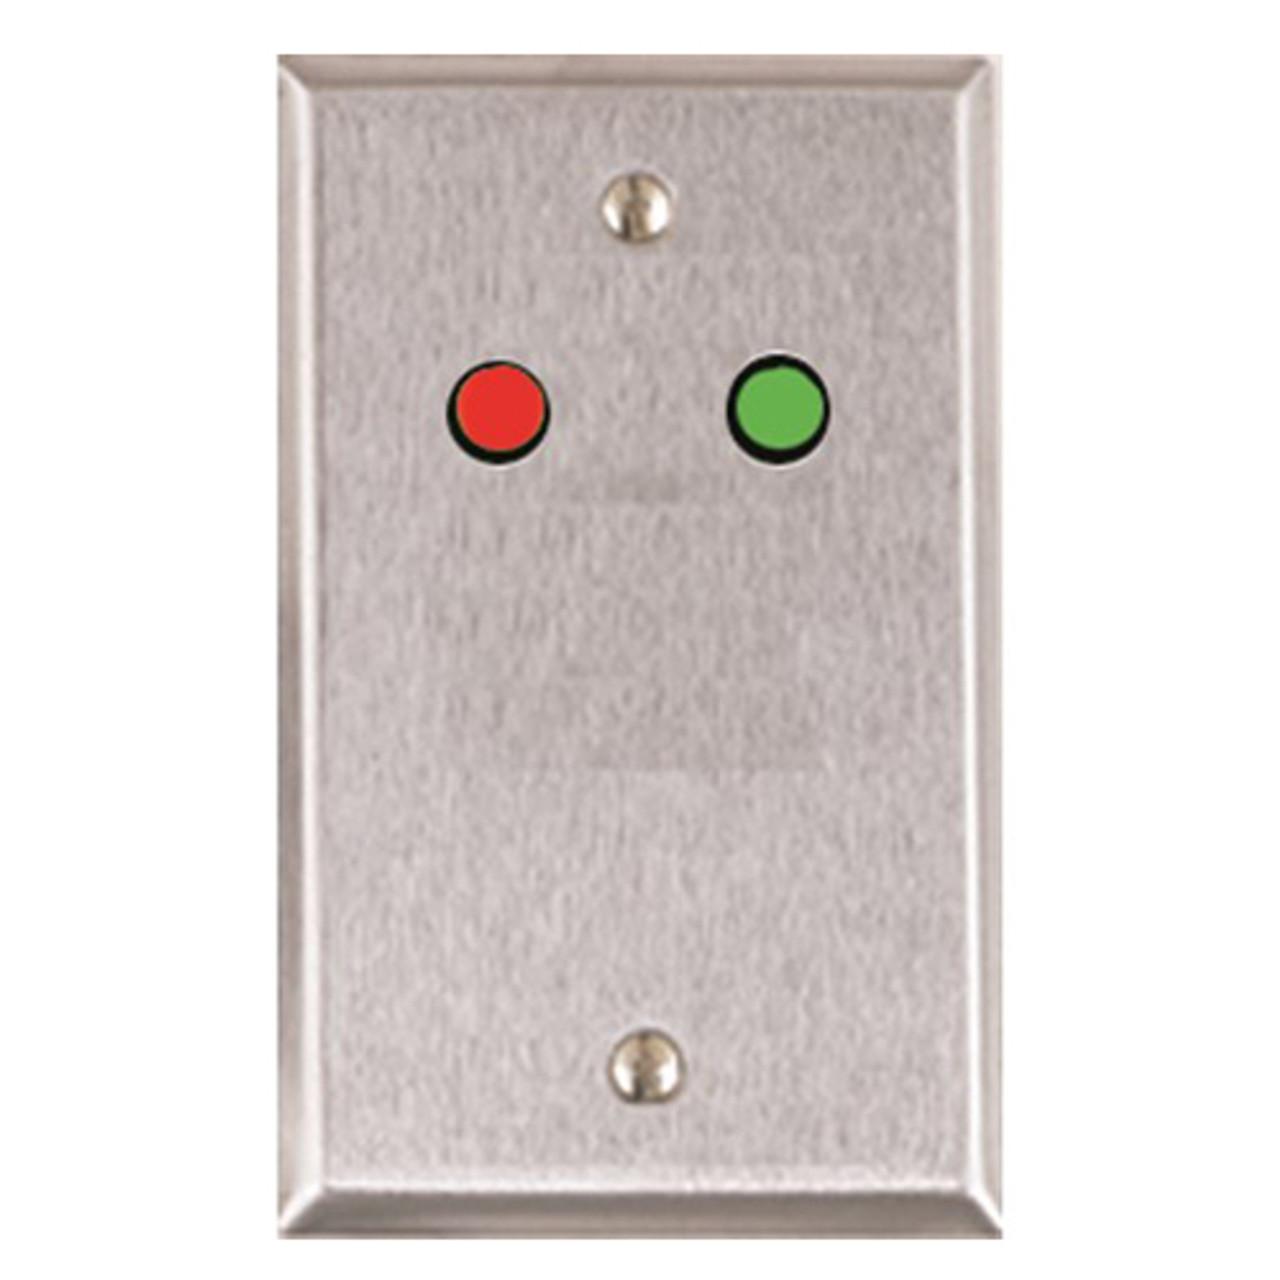 ASP-RP-9 ASP Alarm Control Single Gang Wall Plate